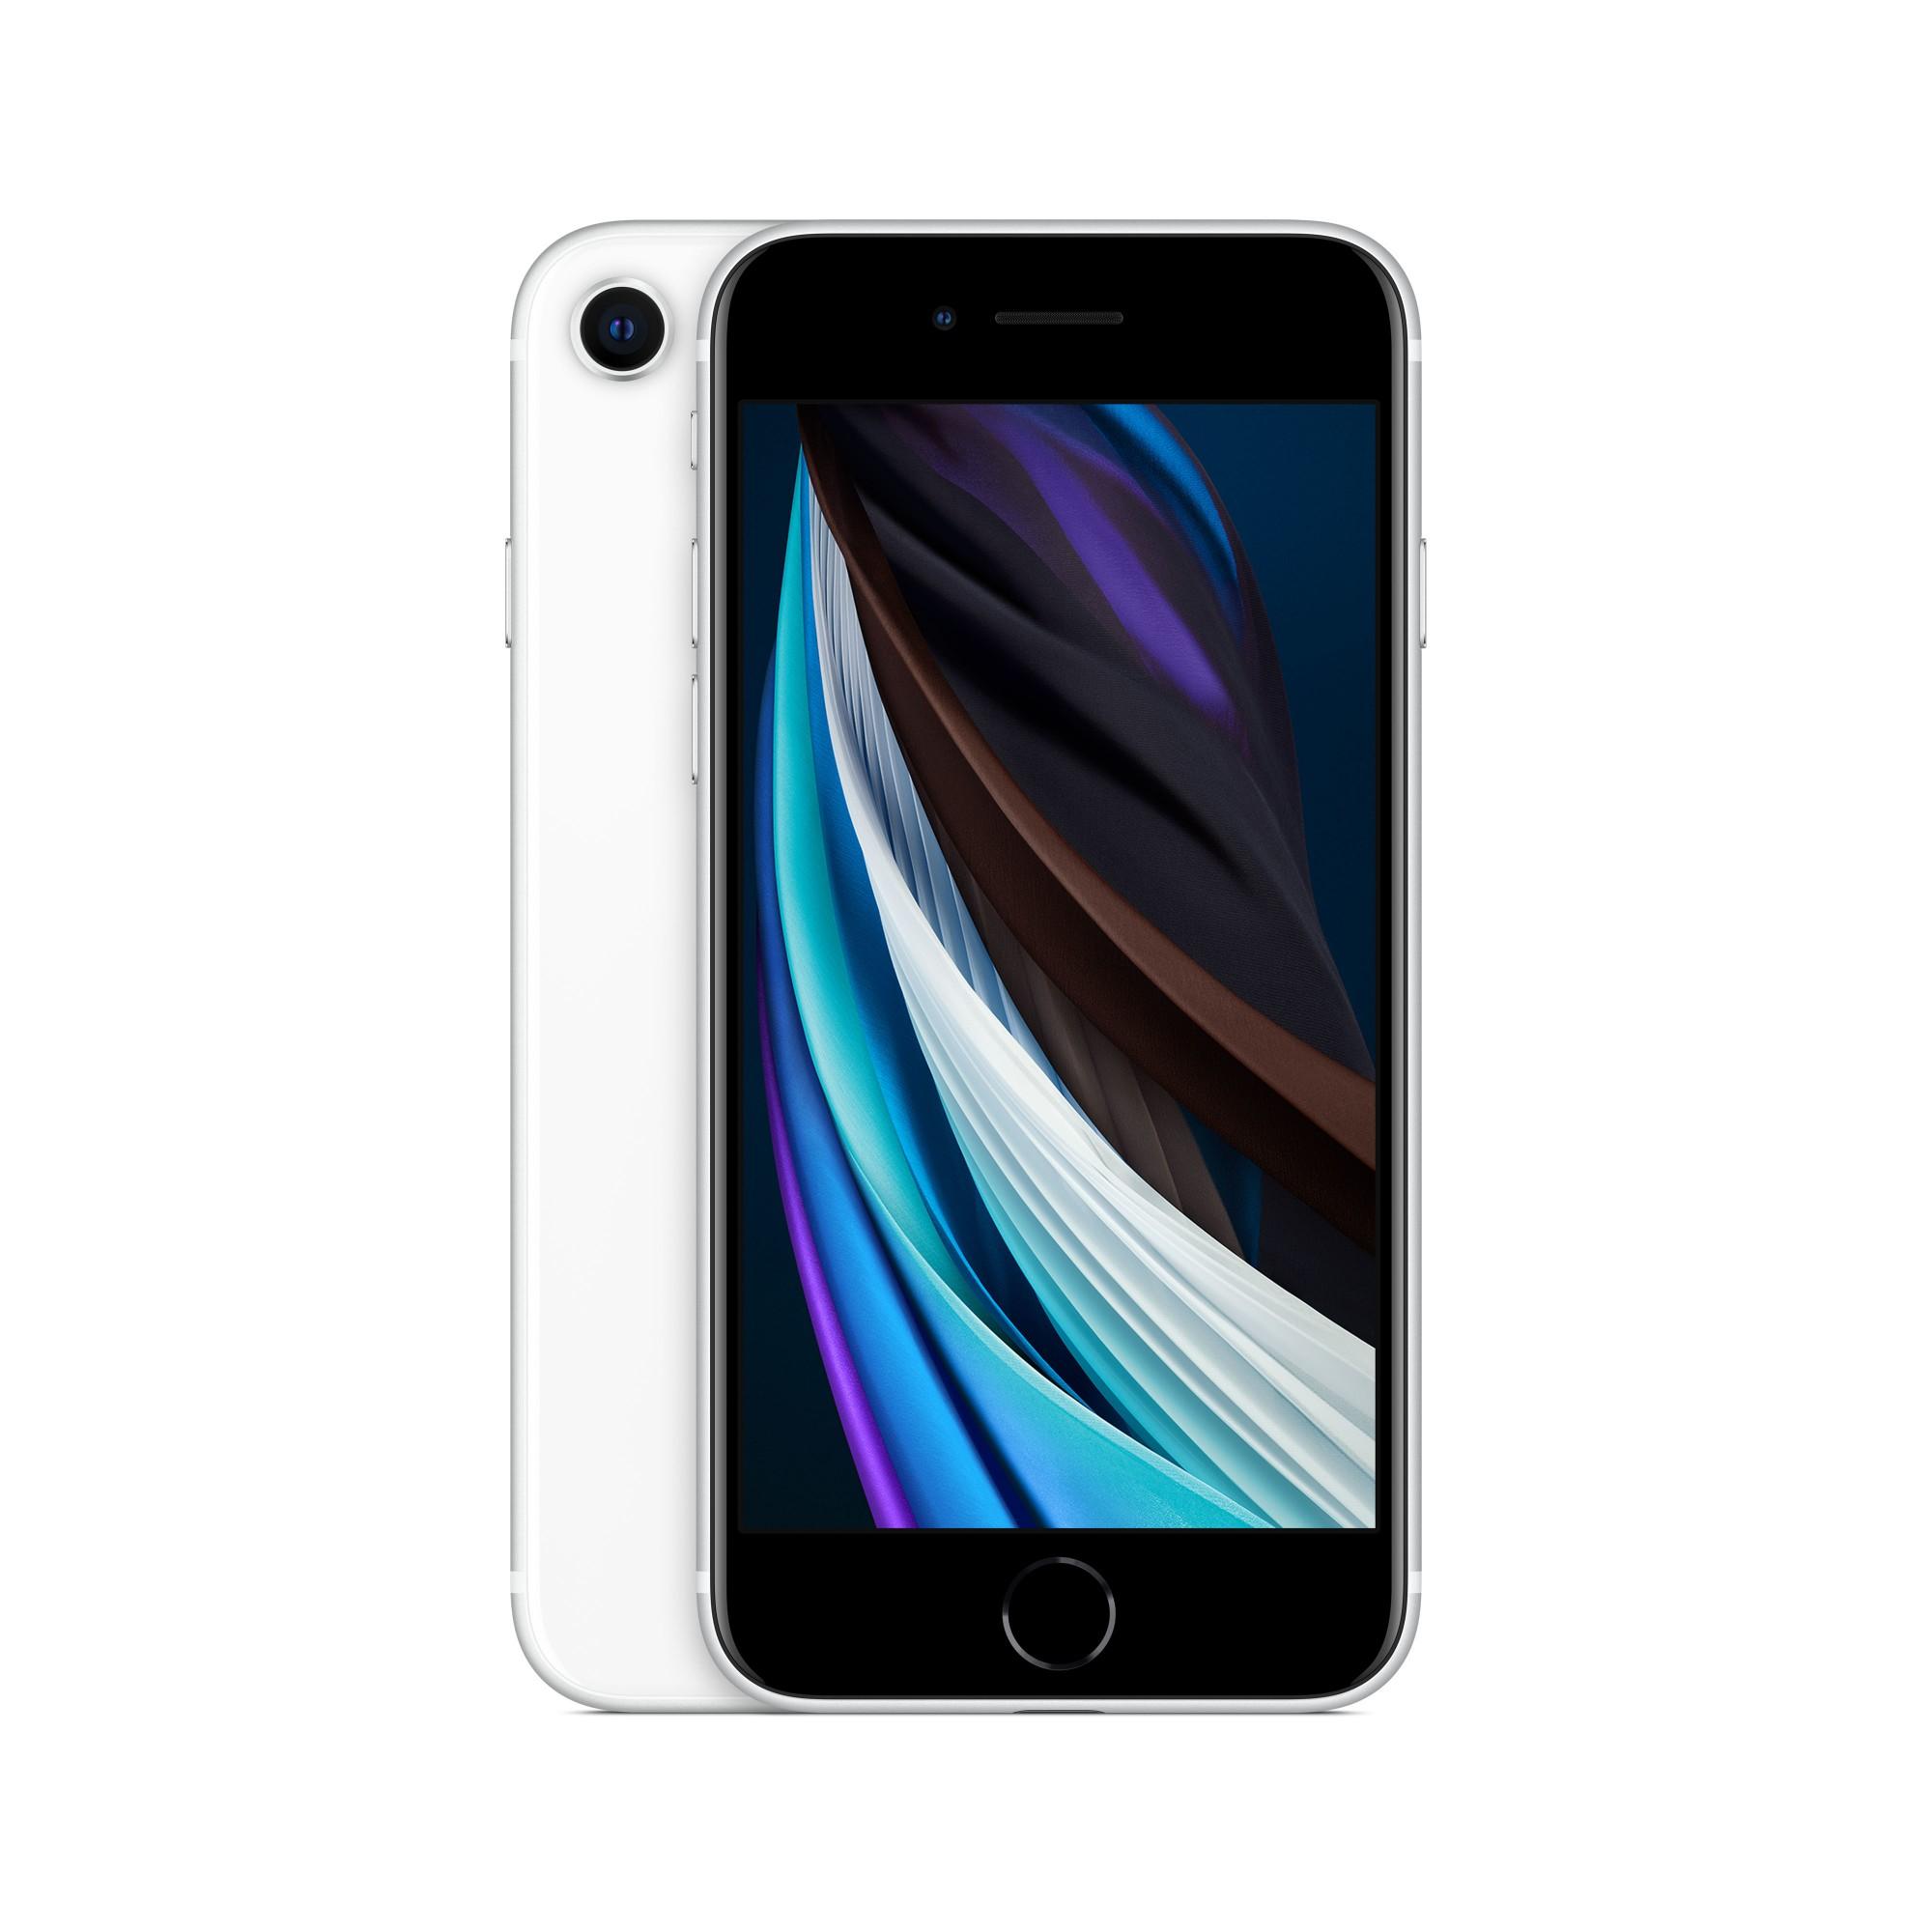 "Apple iPhone SE 11,9 cm (4.7"") 64 GB Ranura híbrida Dual SIM 4G Blanco iOS 13"